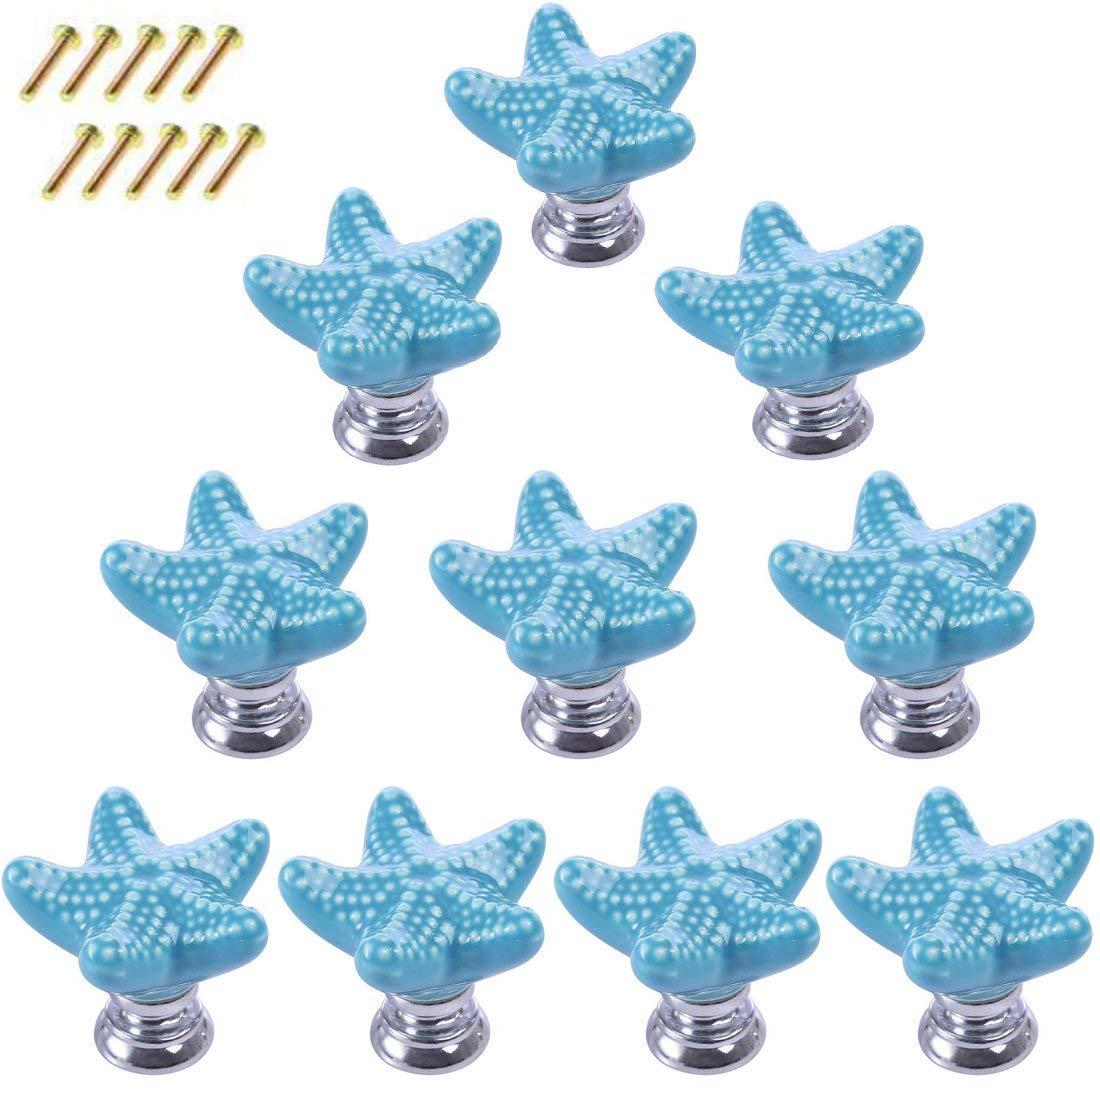 10 Pack Starfish Dresser Knobs,Haoun Starfish Ceramic Knobs Handles Pulls for Drawer Cabinet Dresser,with Screws - Blue